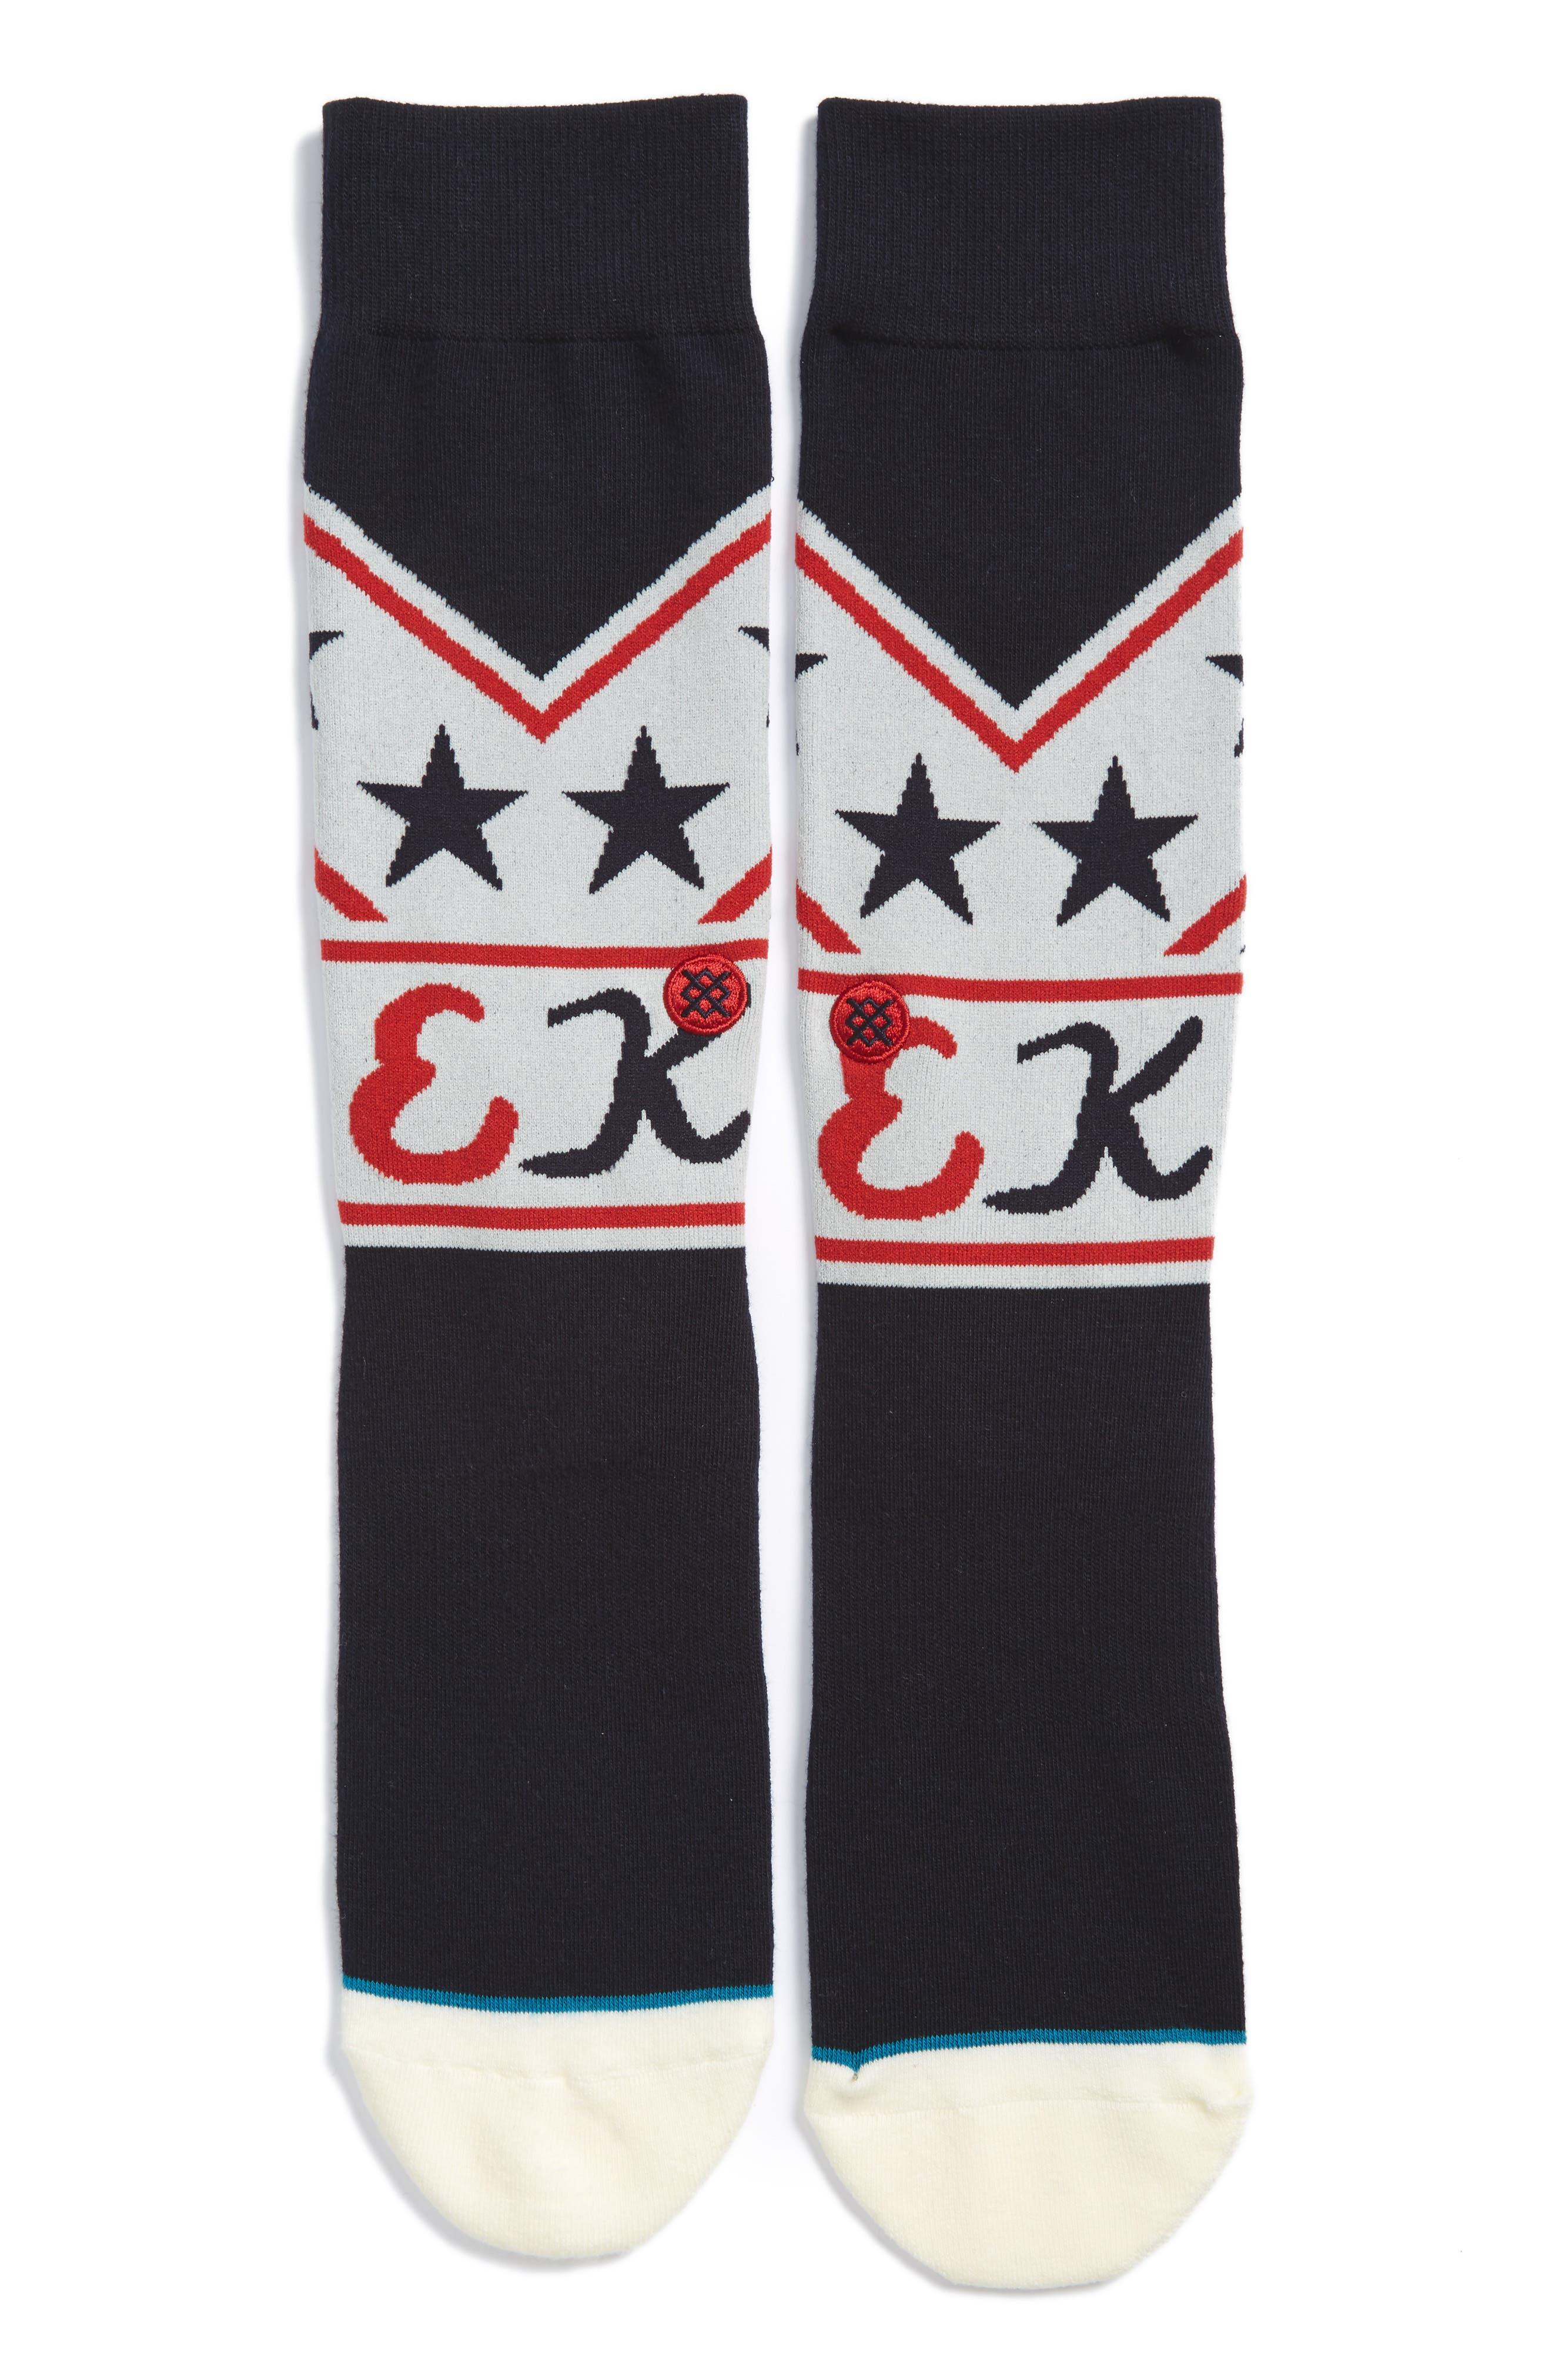 Alternate Image 1 Selected - Stance Suit Up Socks